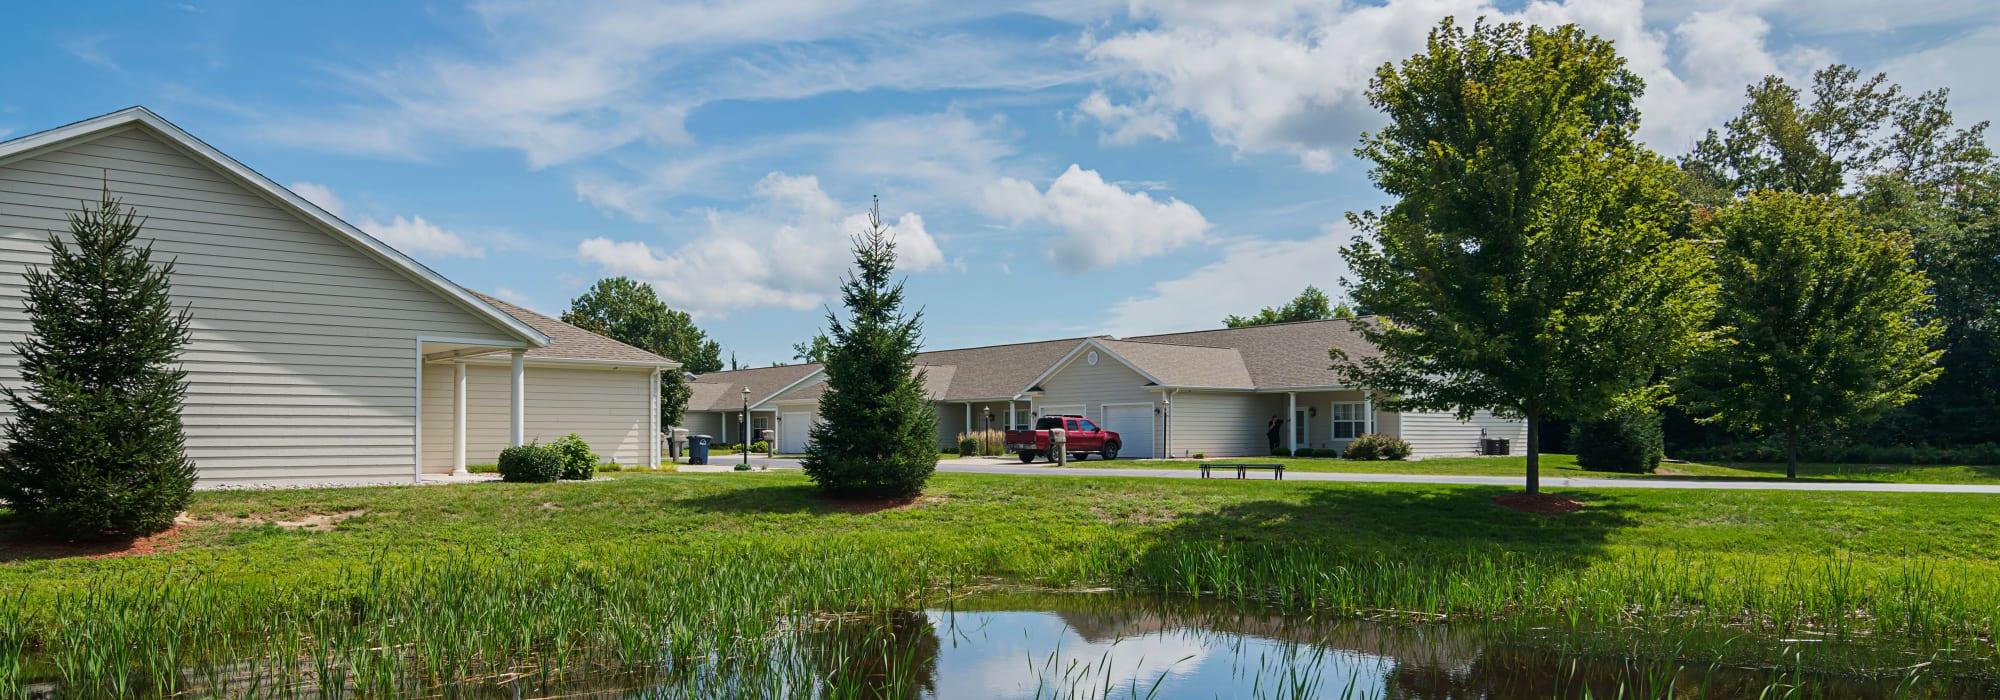 Senior living options at the senior living community in Michigan City